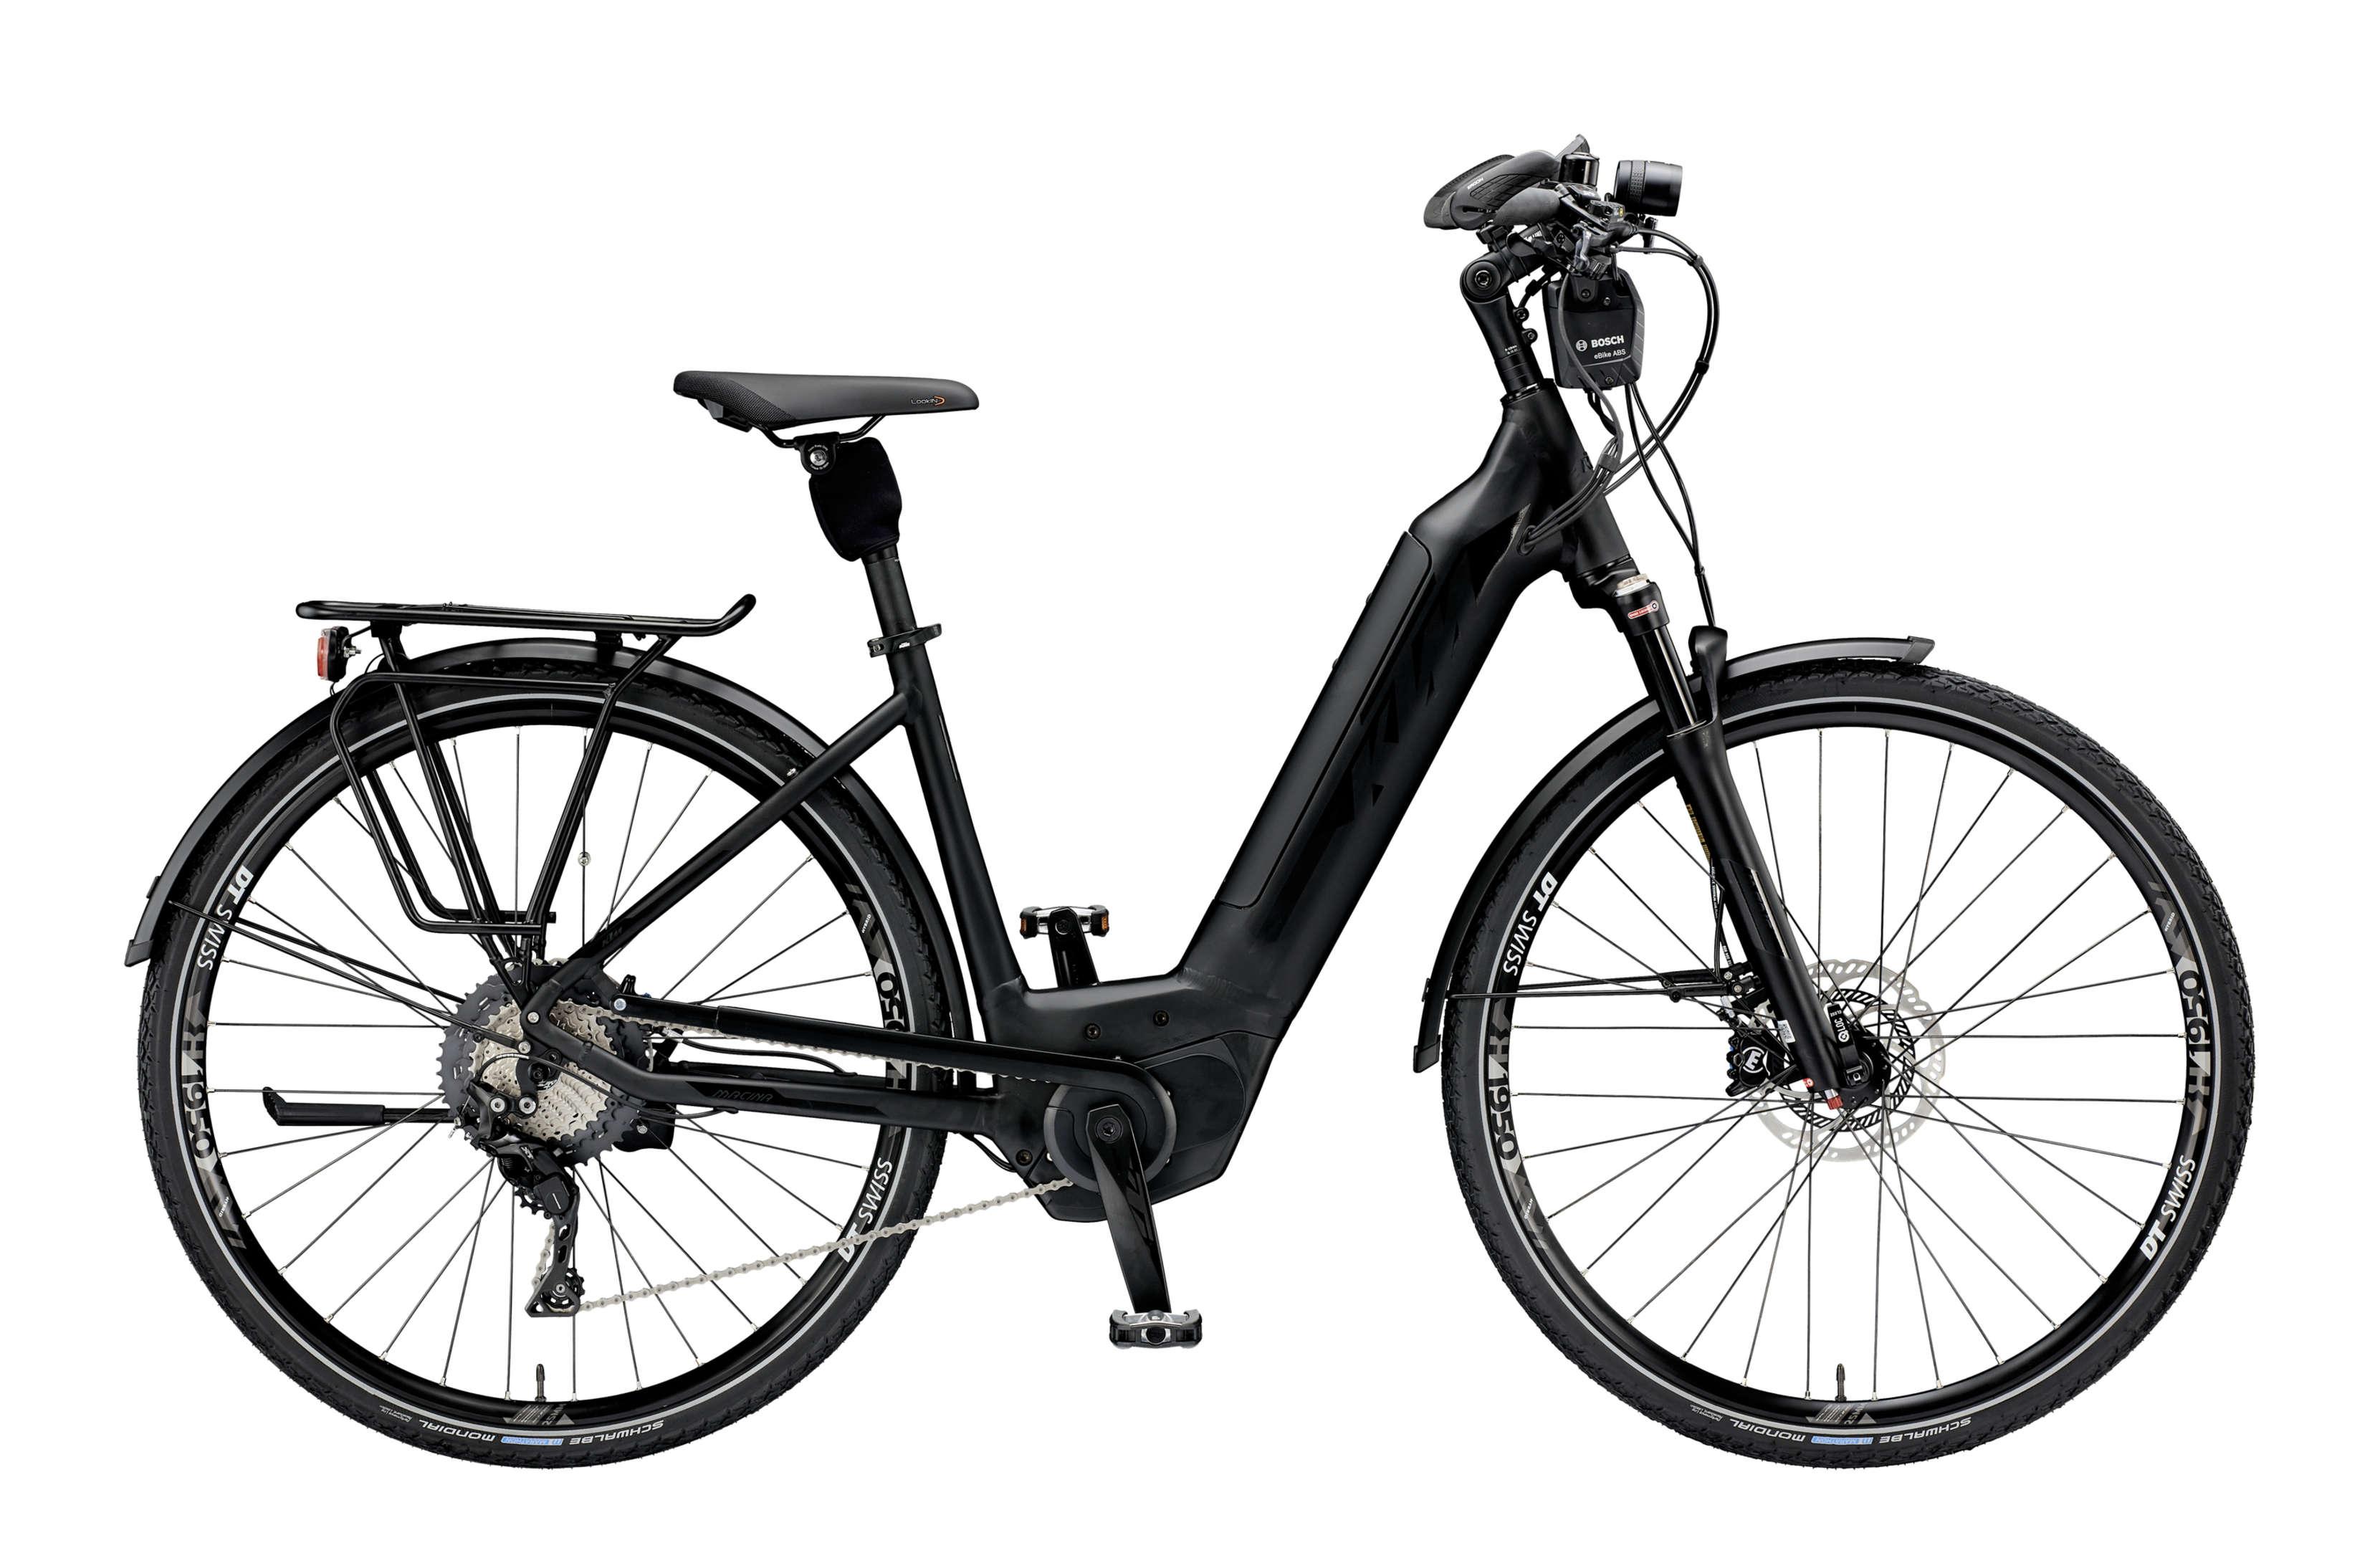 KTM E-Bike Macina City ABS 11 pt-p5i4